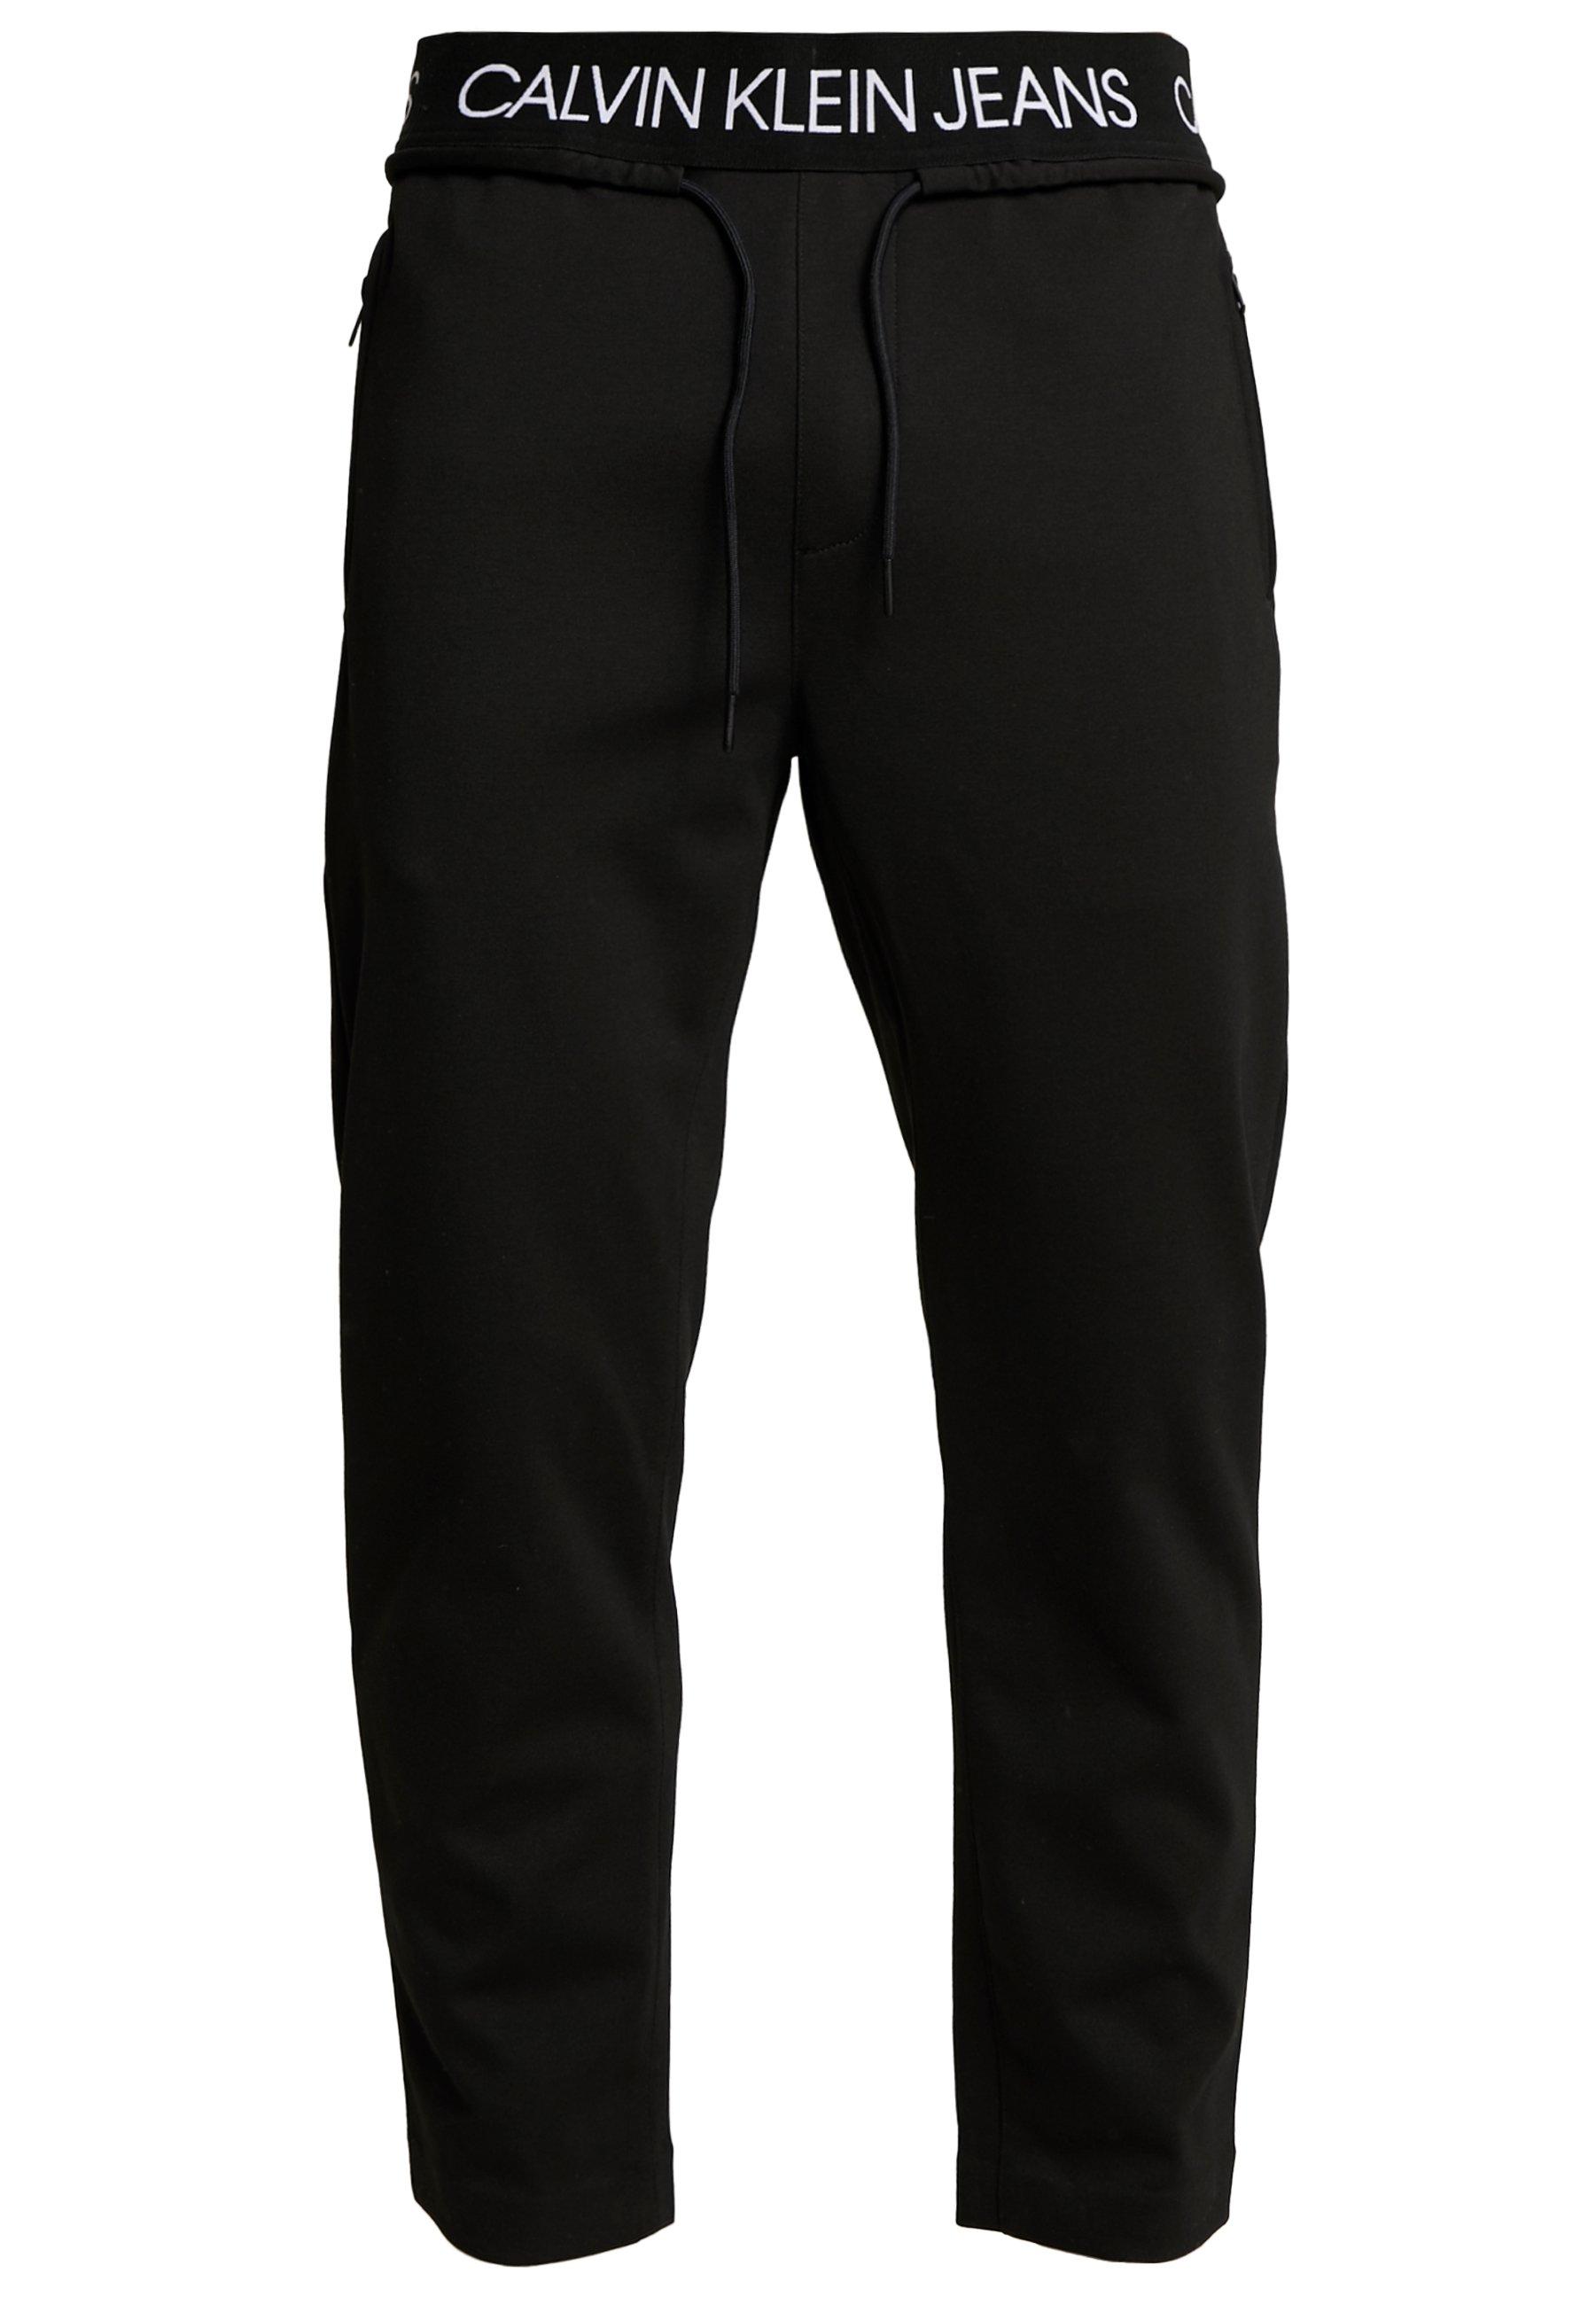 Calvin Klein Jeans Exposed Waistband Milano Pant - Pantalon De Survêtement Black jJuaIFO